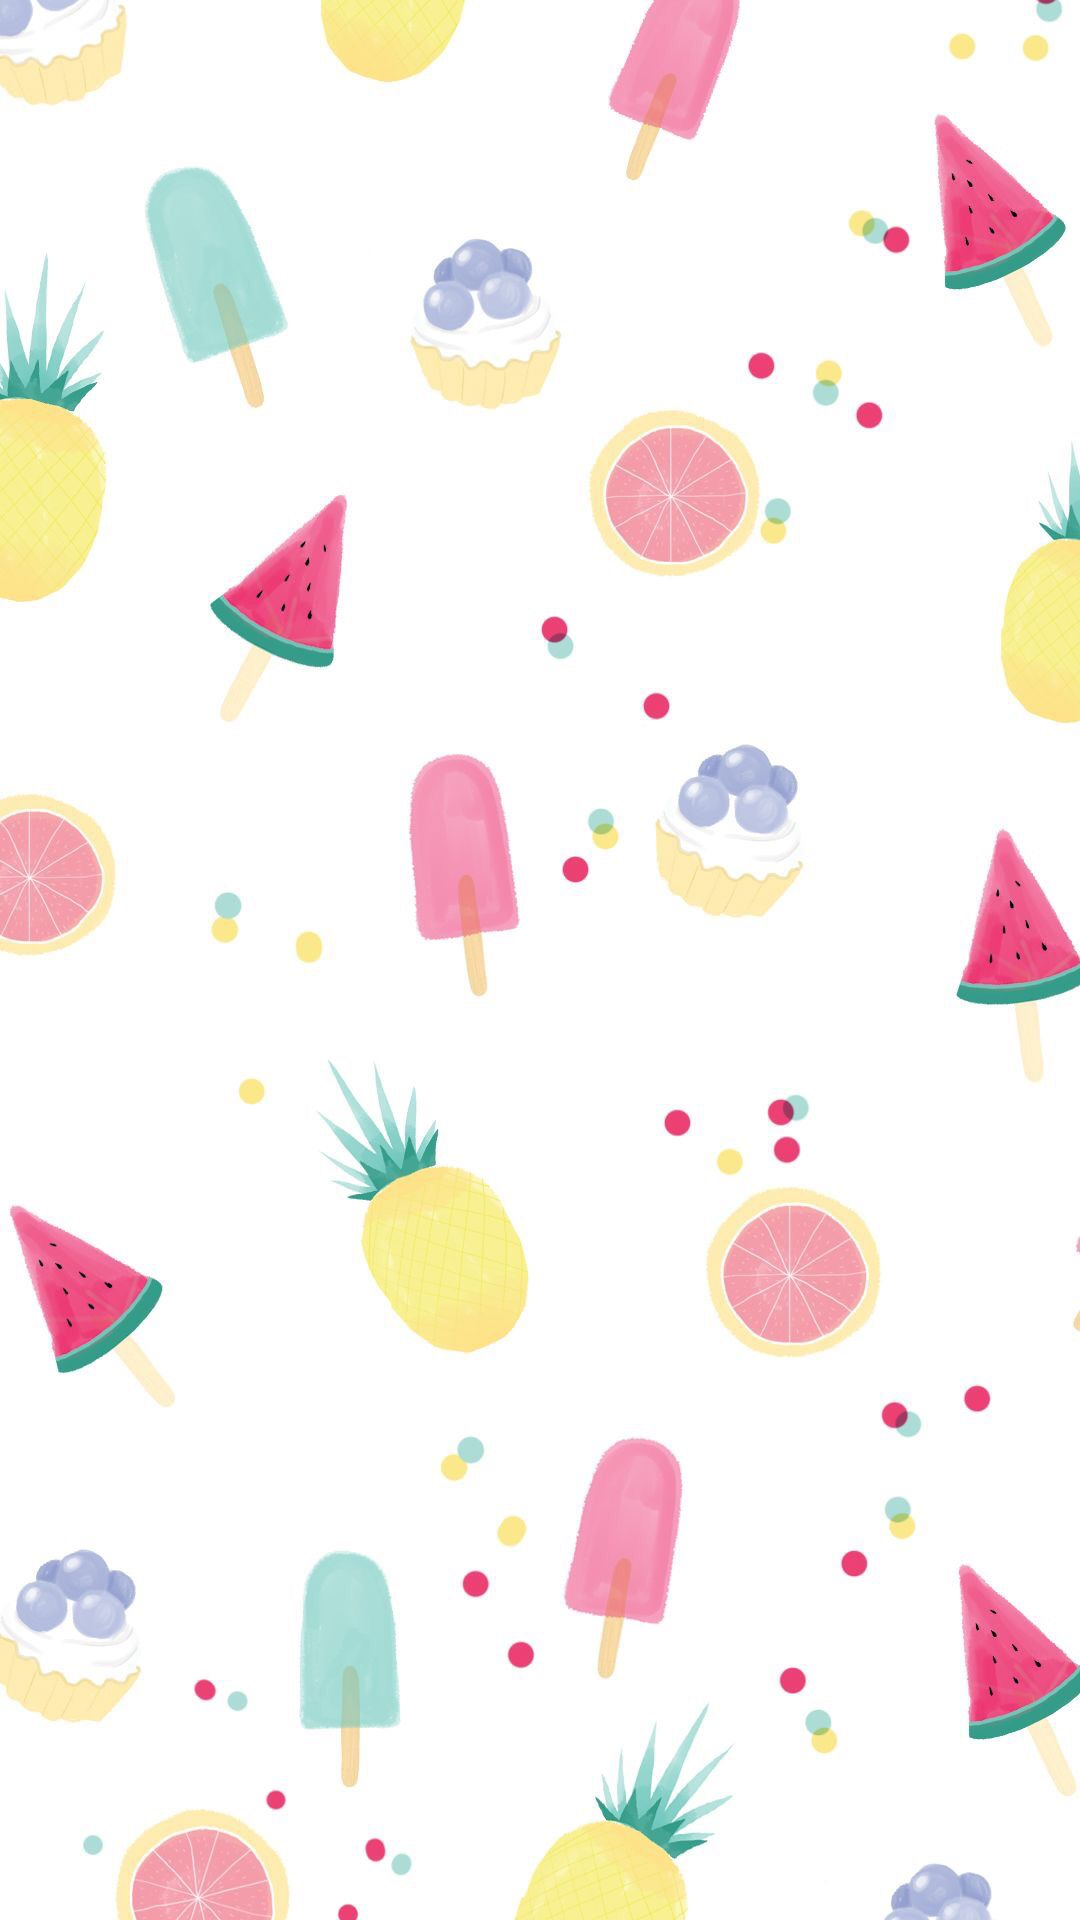 Wallpaper food Wallpapers   Iphone wallpaper Cute wallpapers en 1080x1920